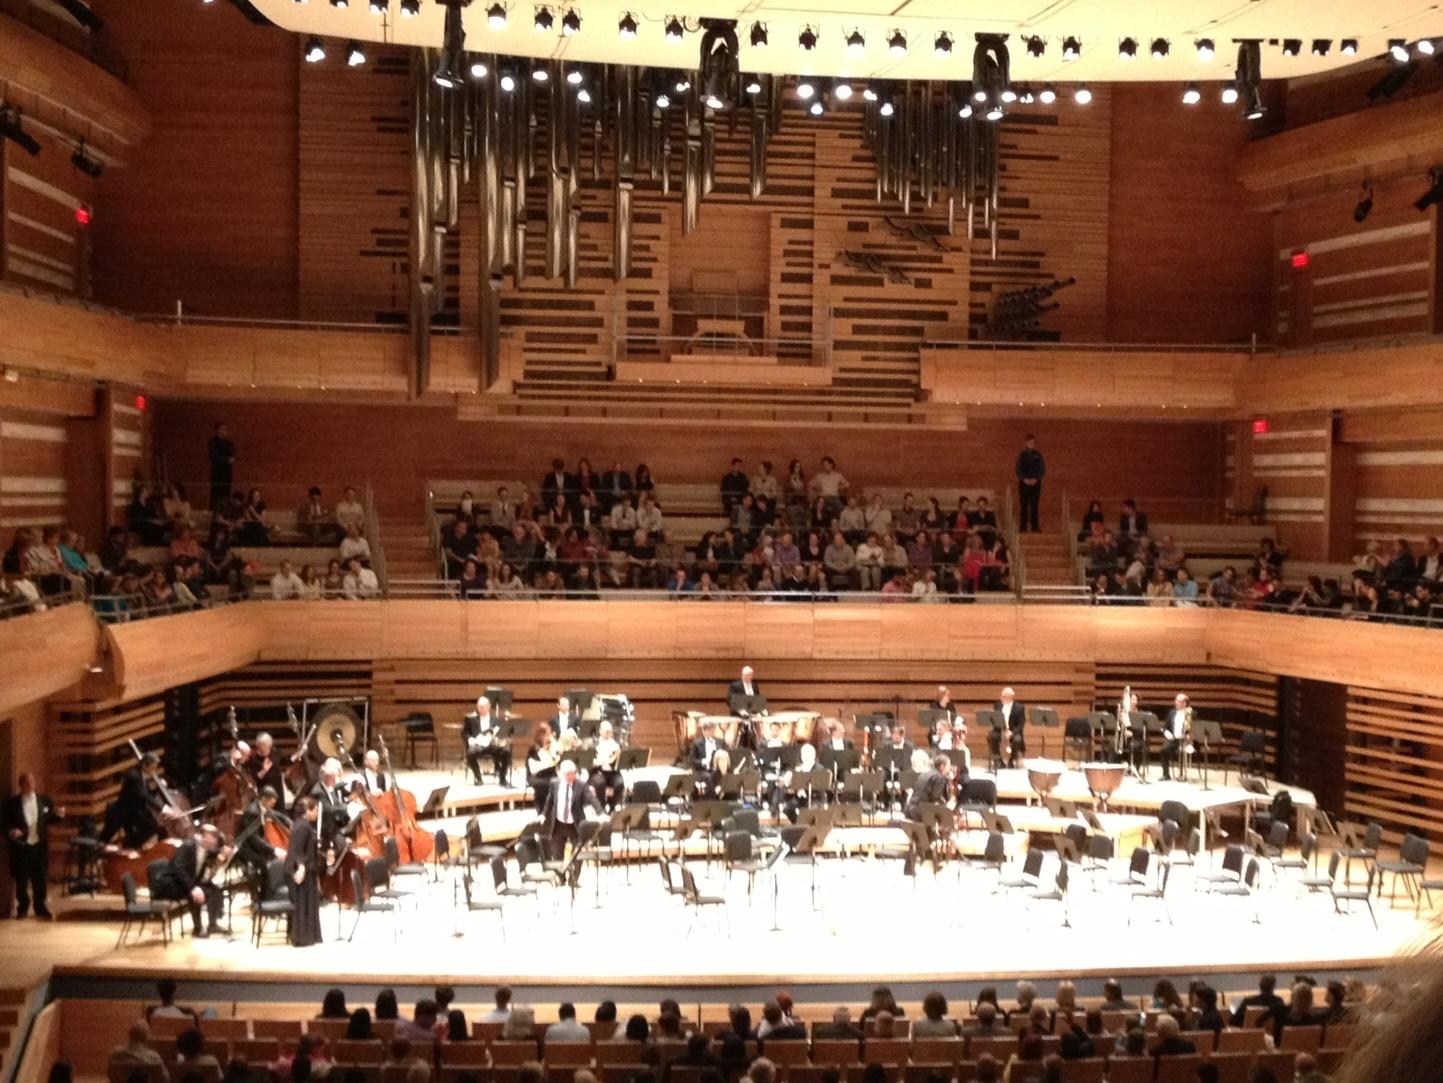 May_22_-_Montreal_Symphony_hall_and_organ.JPG